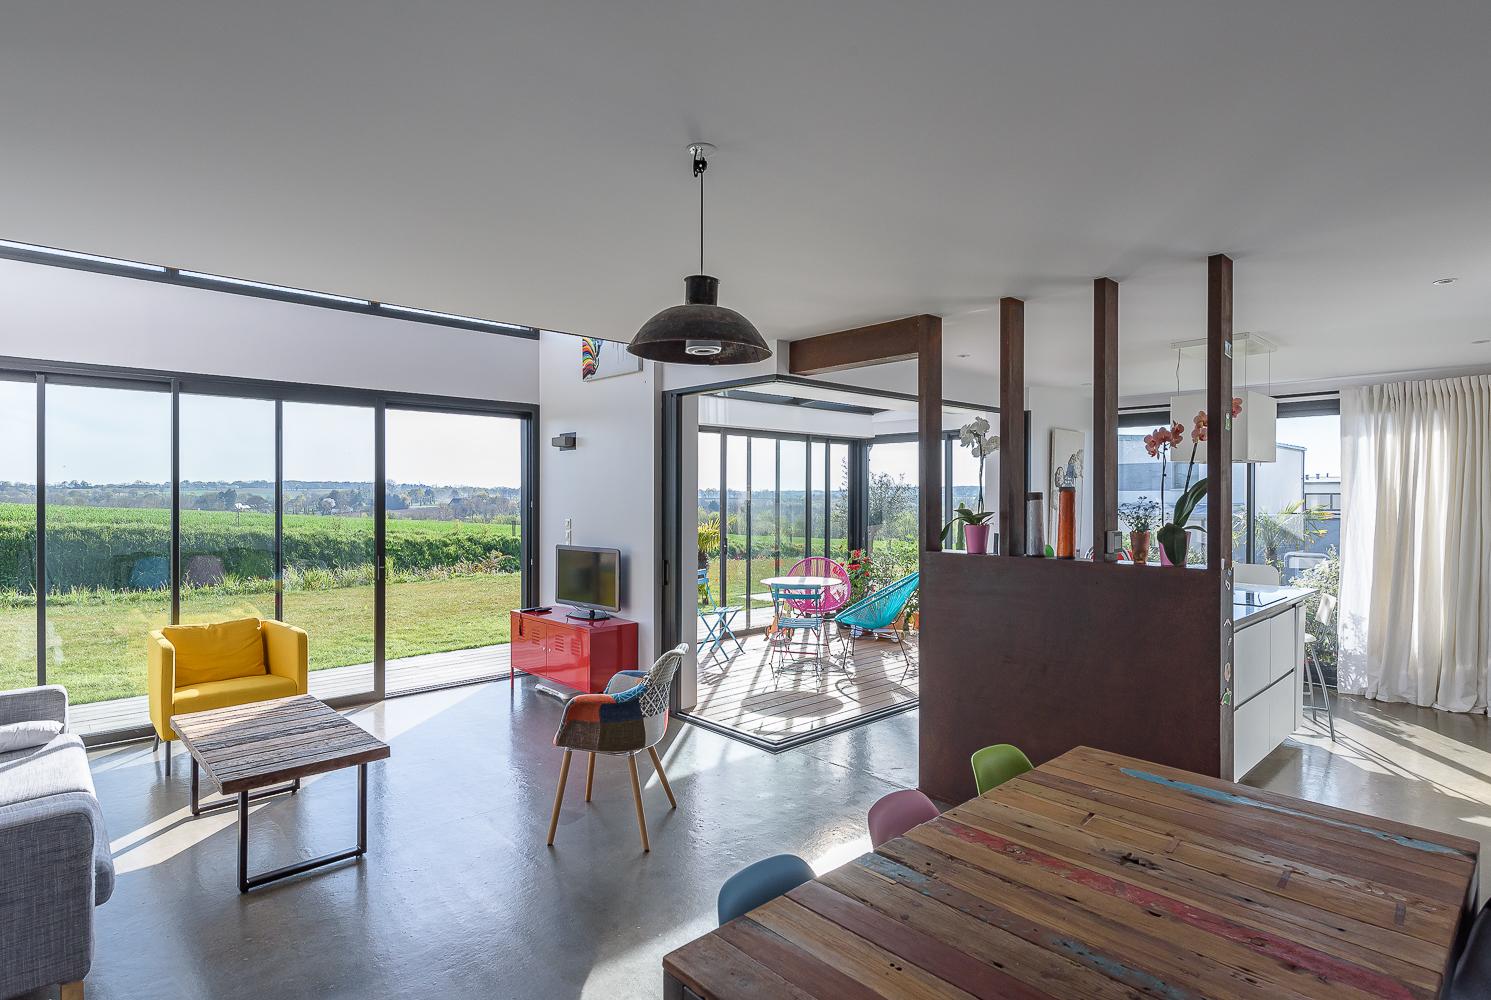 photographe d'architecture ©INTERVALphoto : Mickaël TANGUY architecte, maison Melesse (35)